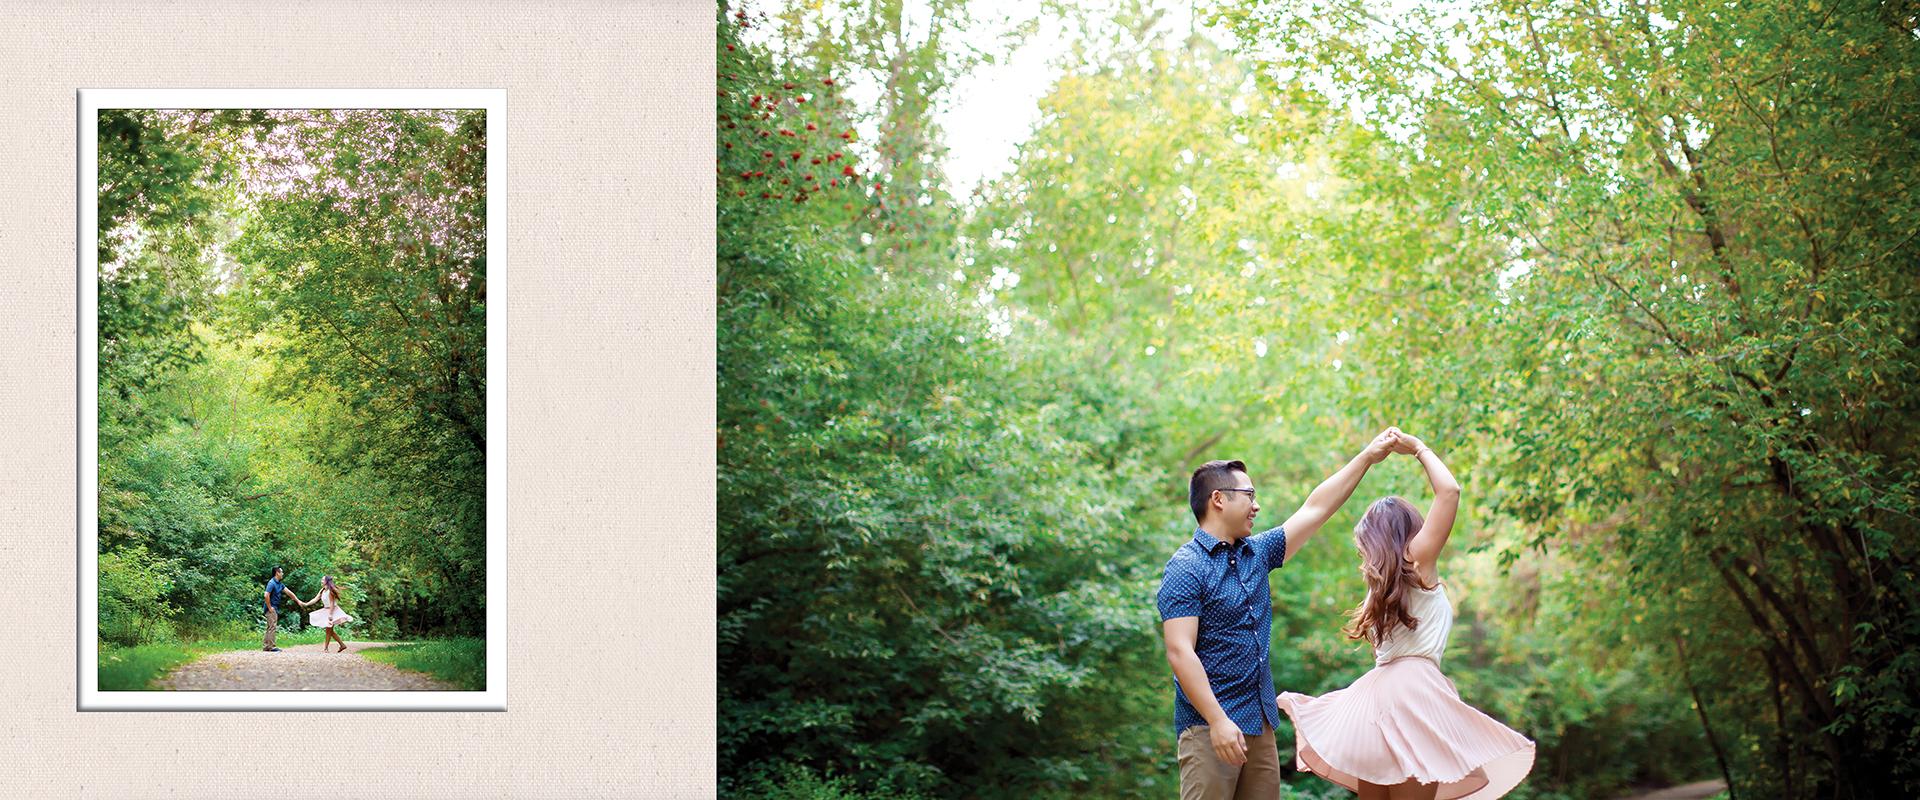 Seasons inspired engagement album :: Caitlyn + Jordan pages 7-8